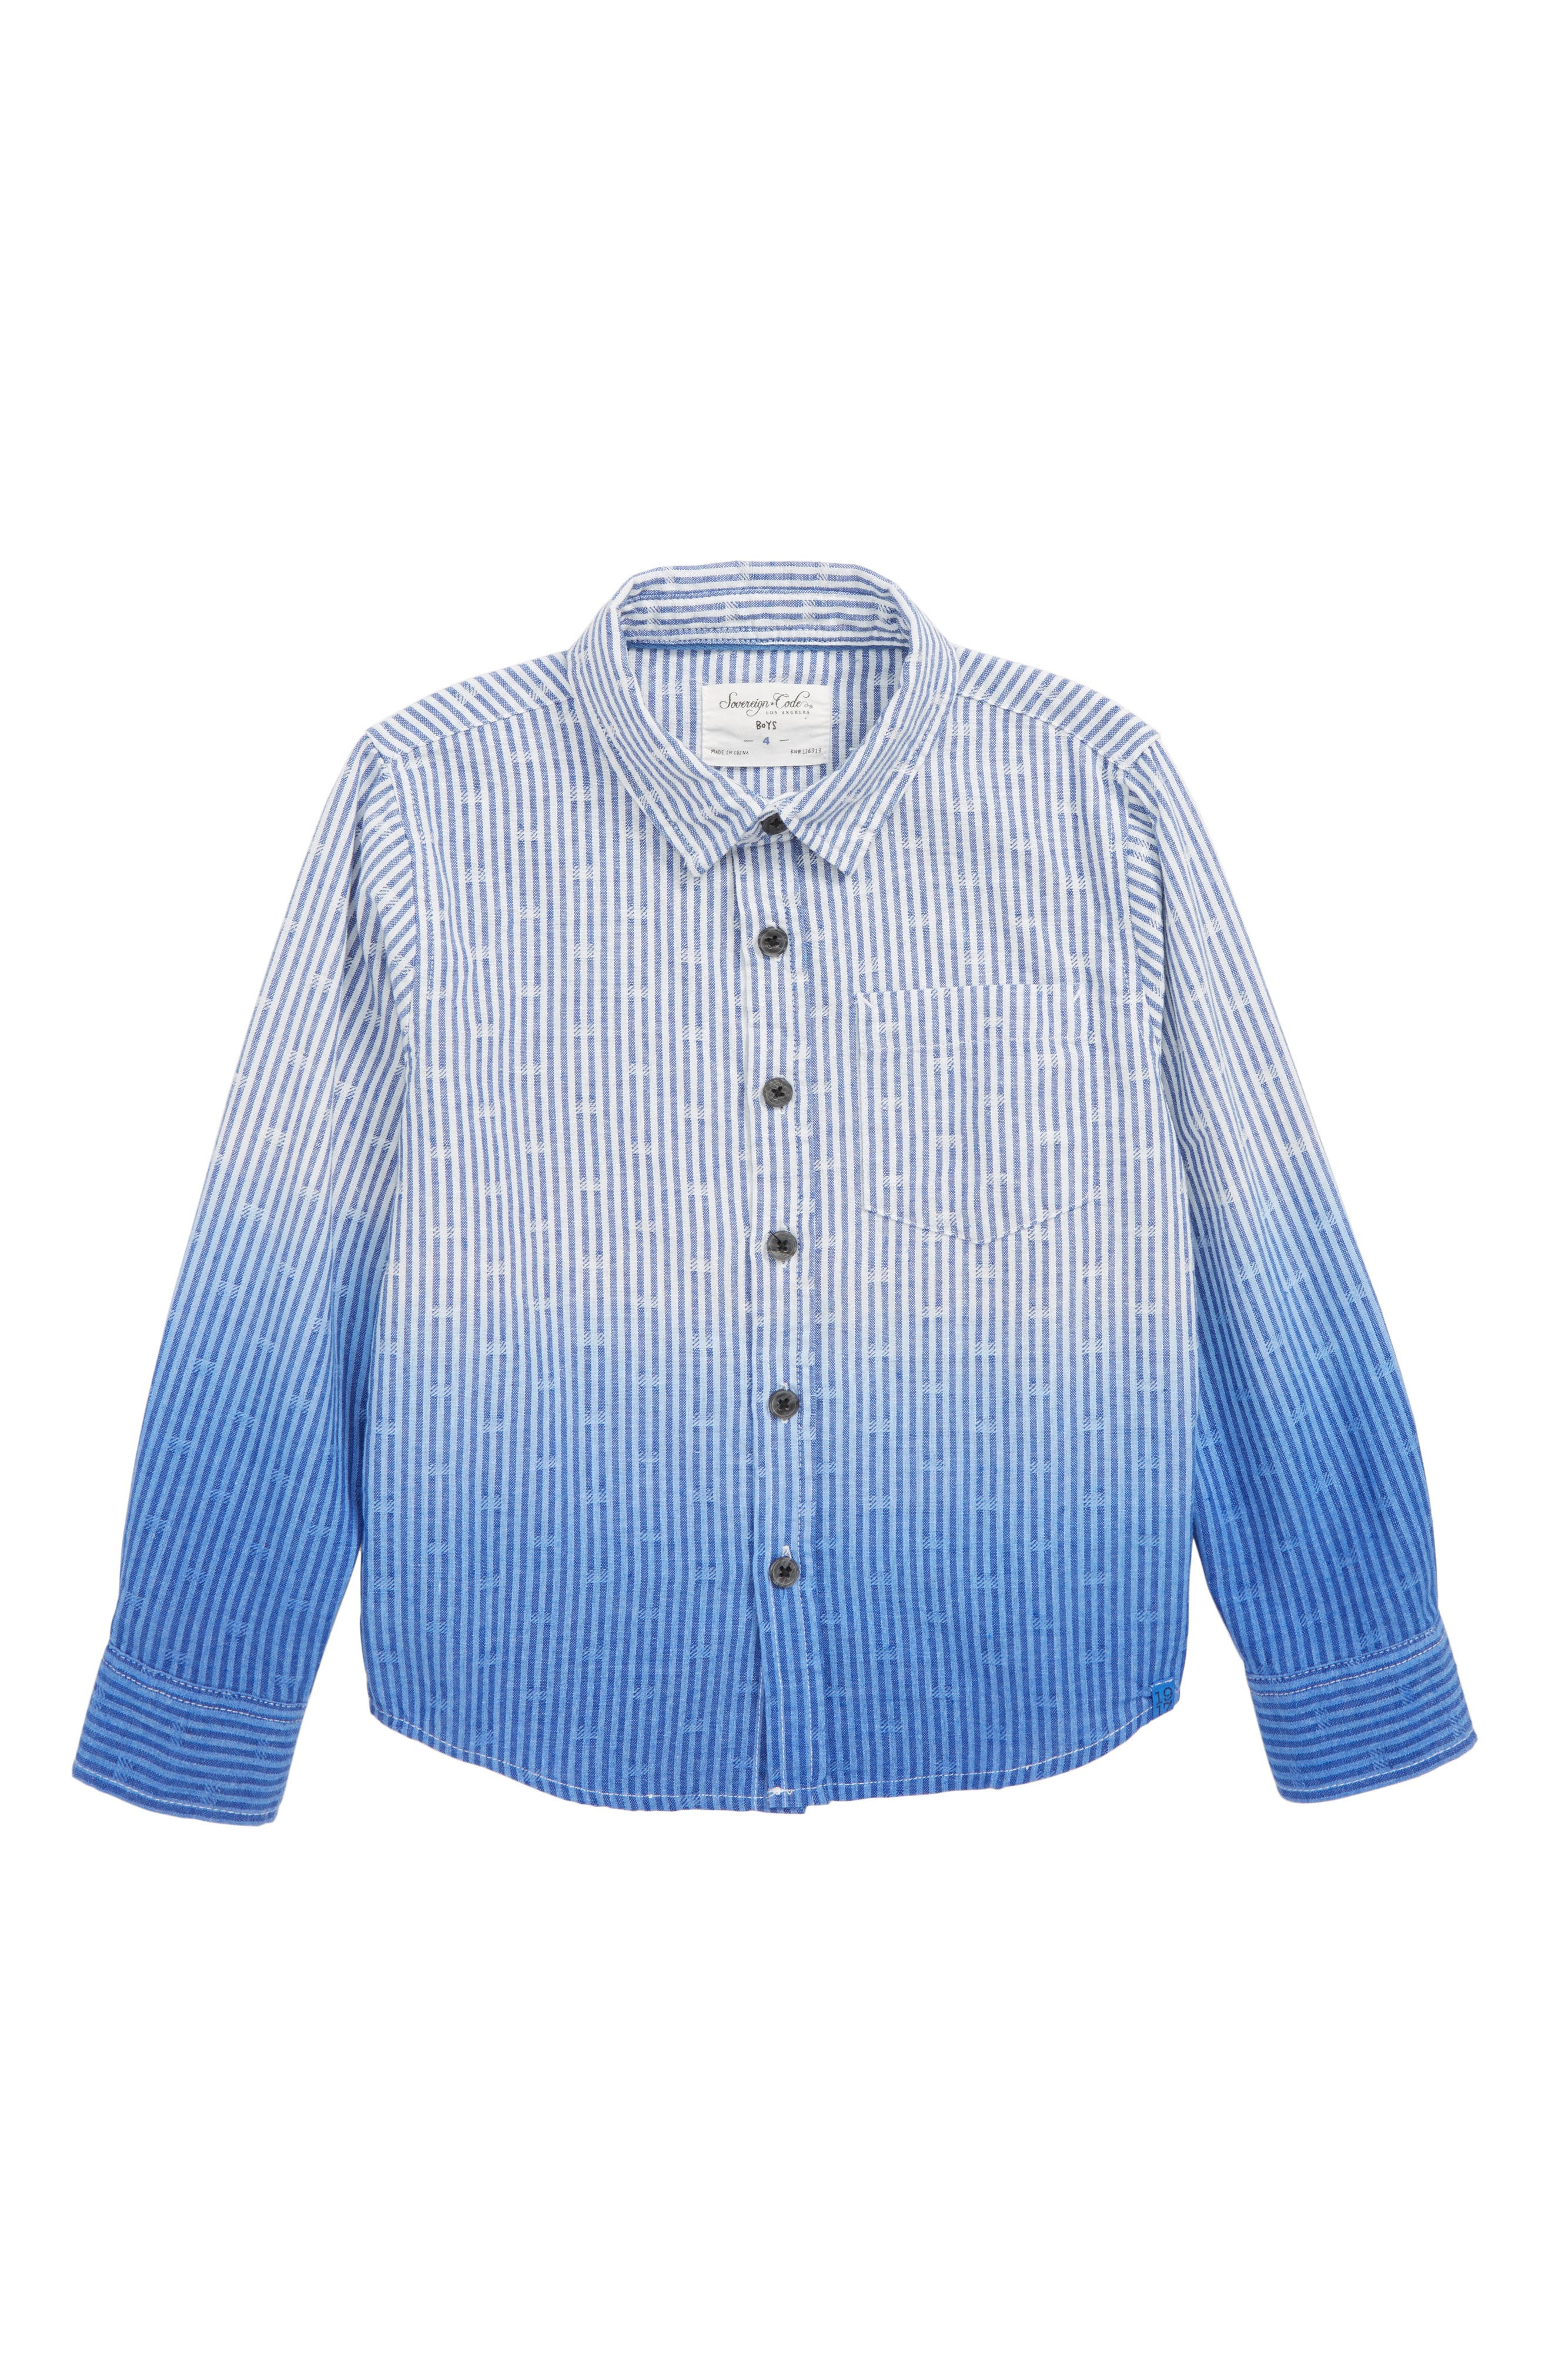 Capitola Shirt,                         Main,                         color, BLUE STRIPE